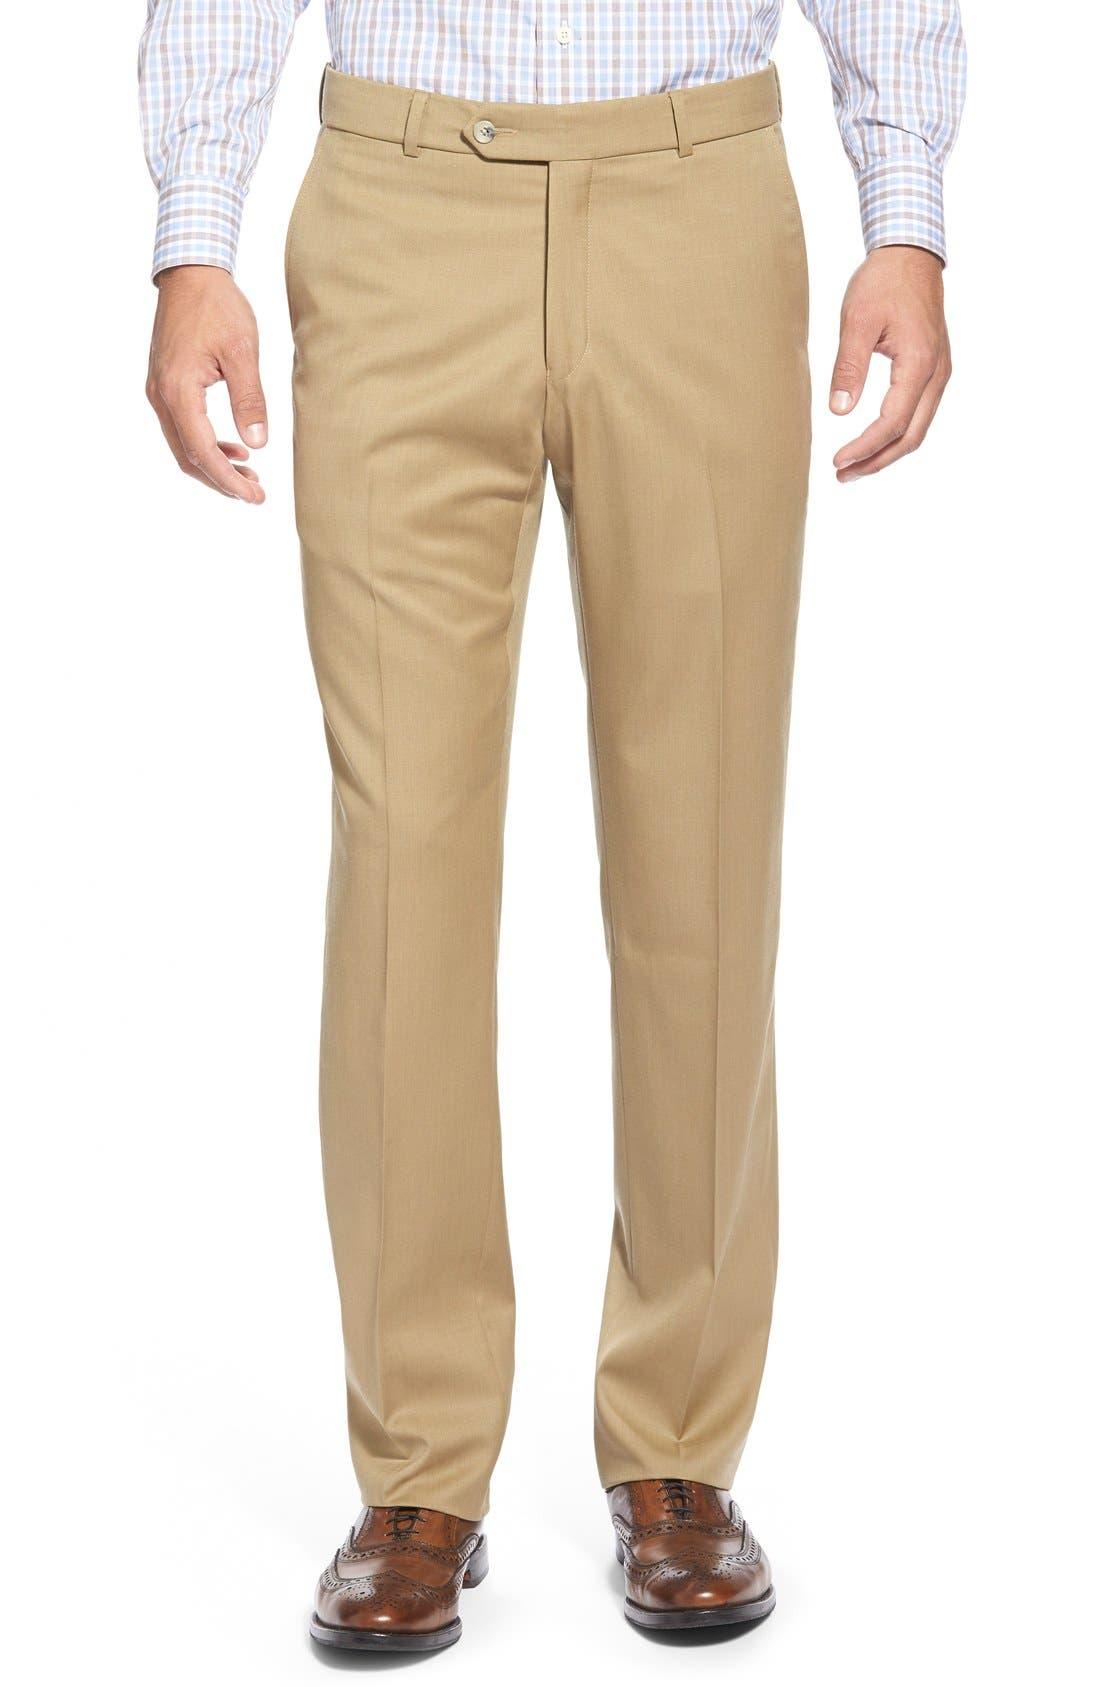 BALLIN Flat Front Solid Wool Trousers in Khaki